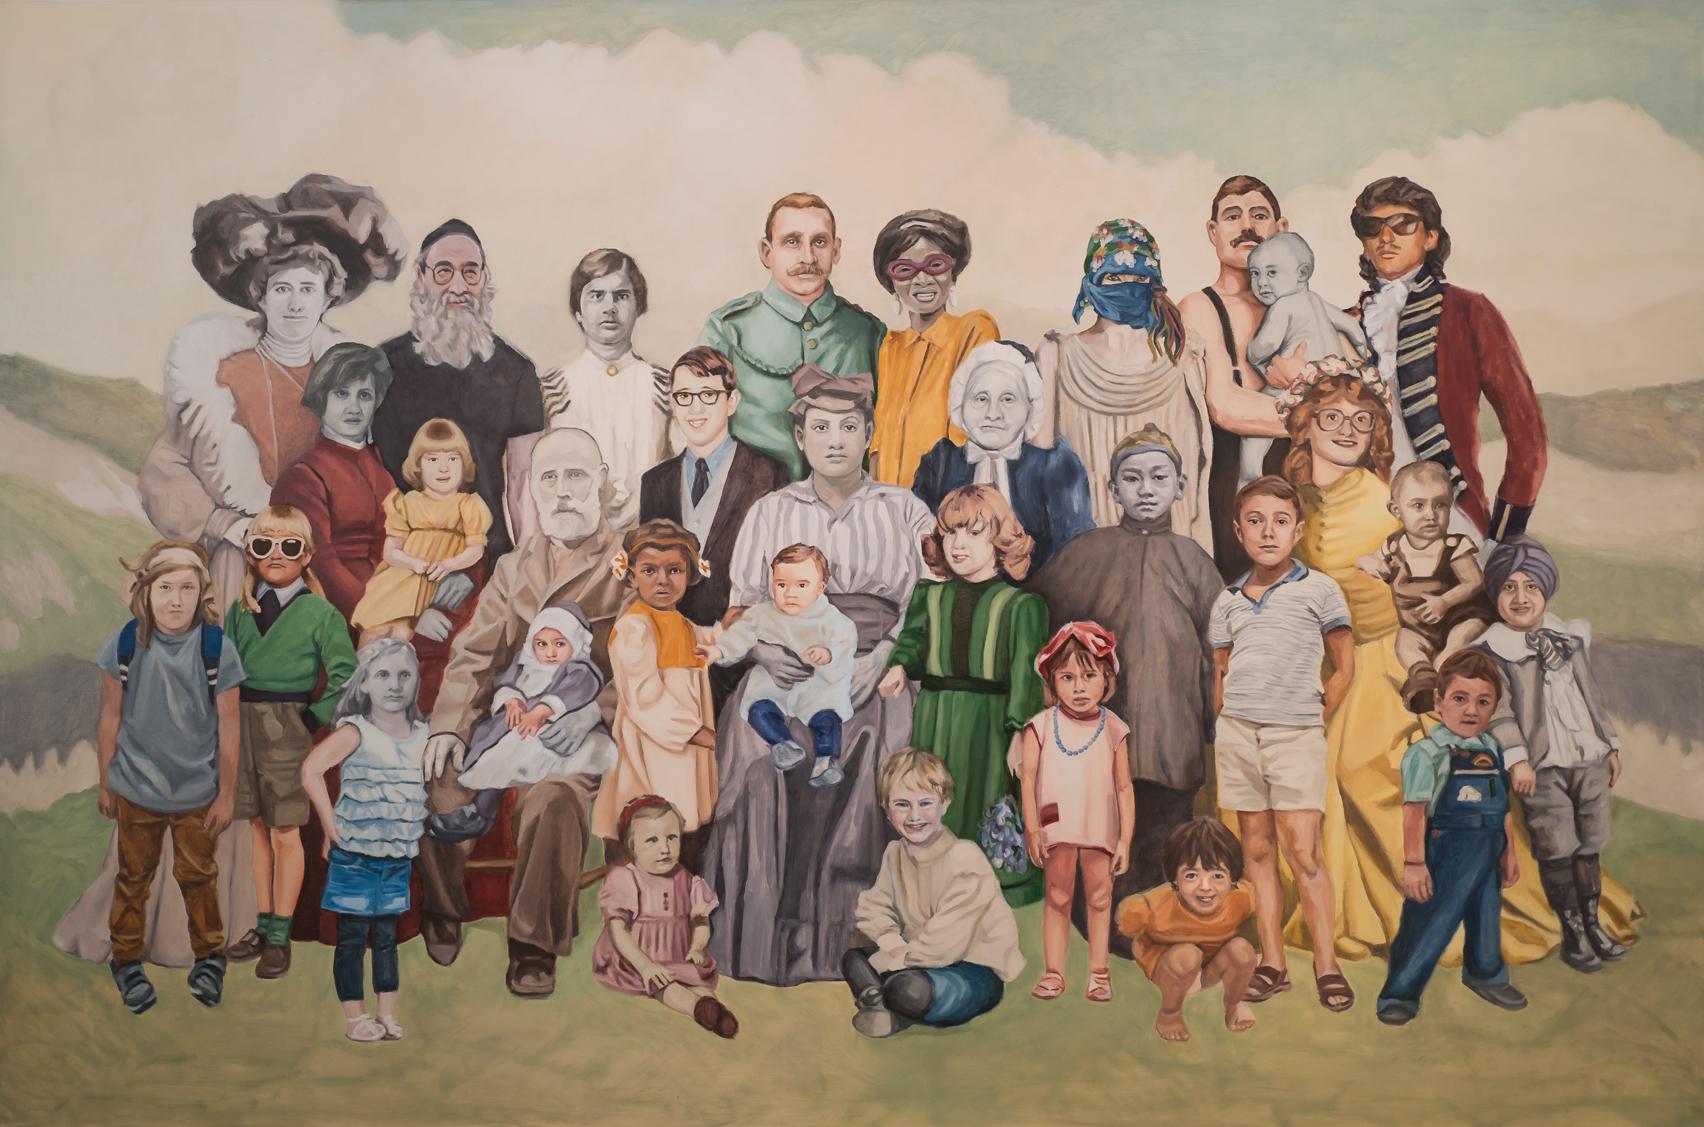 Ctrl X Ctrl V 2, 2016 Oil on canvas 195 x 130 cm